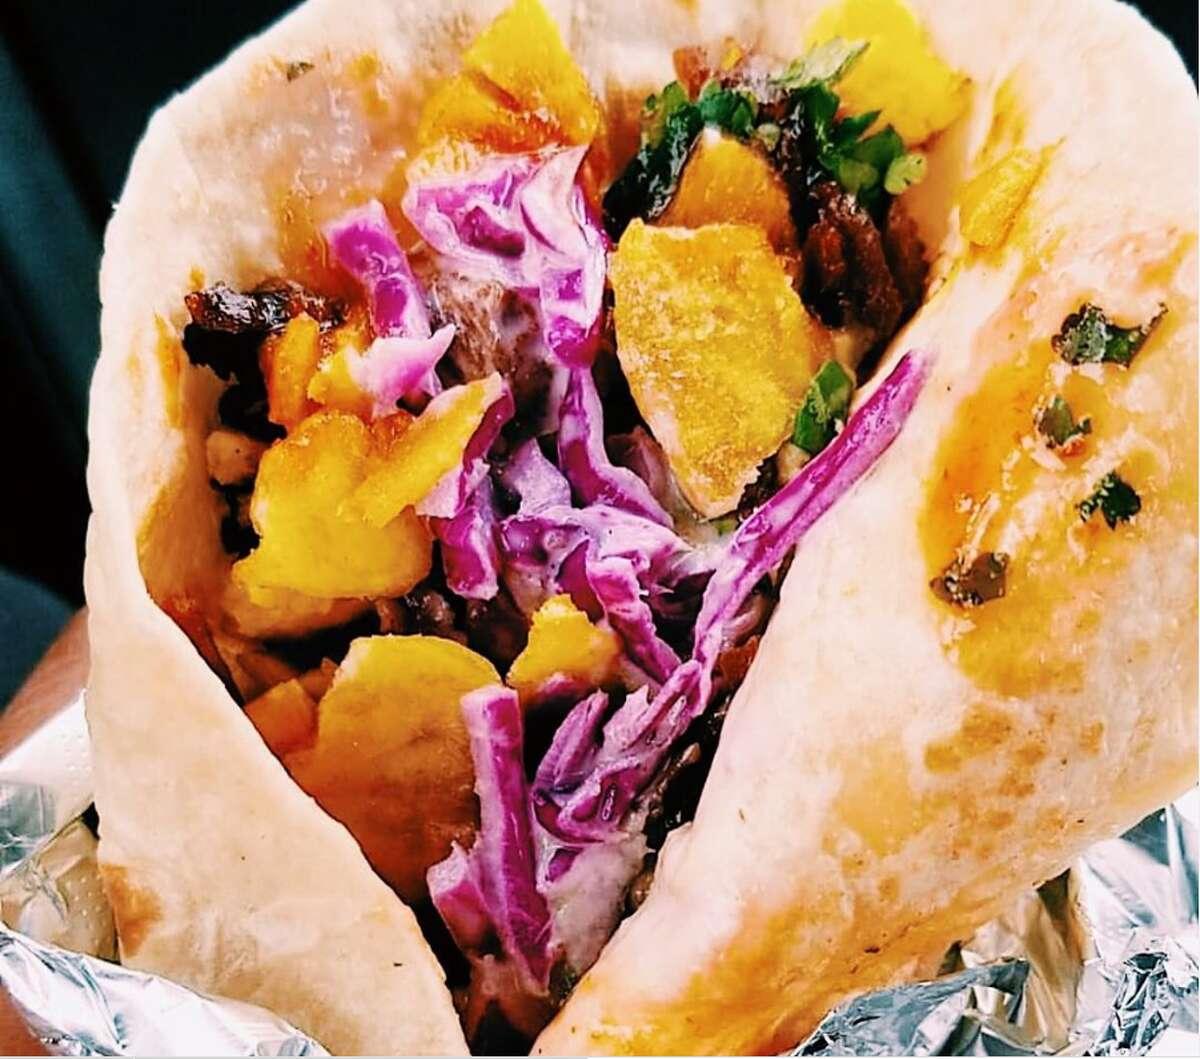 Trill City Tacos: 2887 Dulles Avenue, Missouri City, Texas.